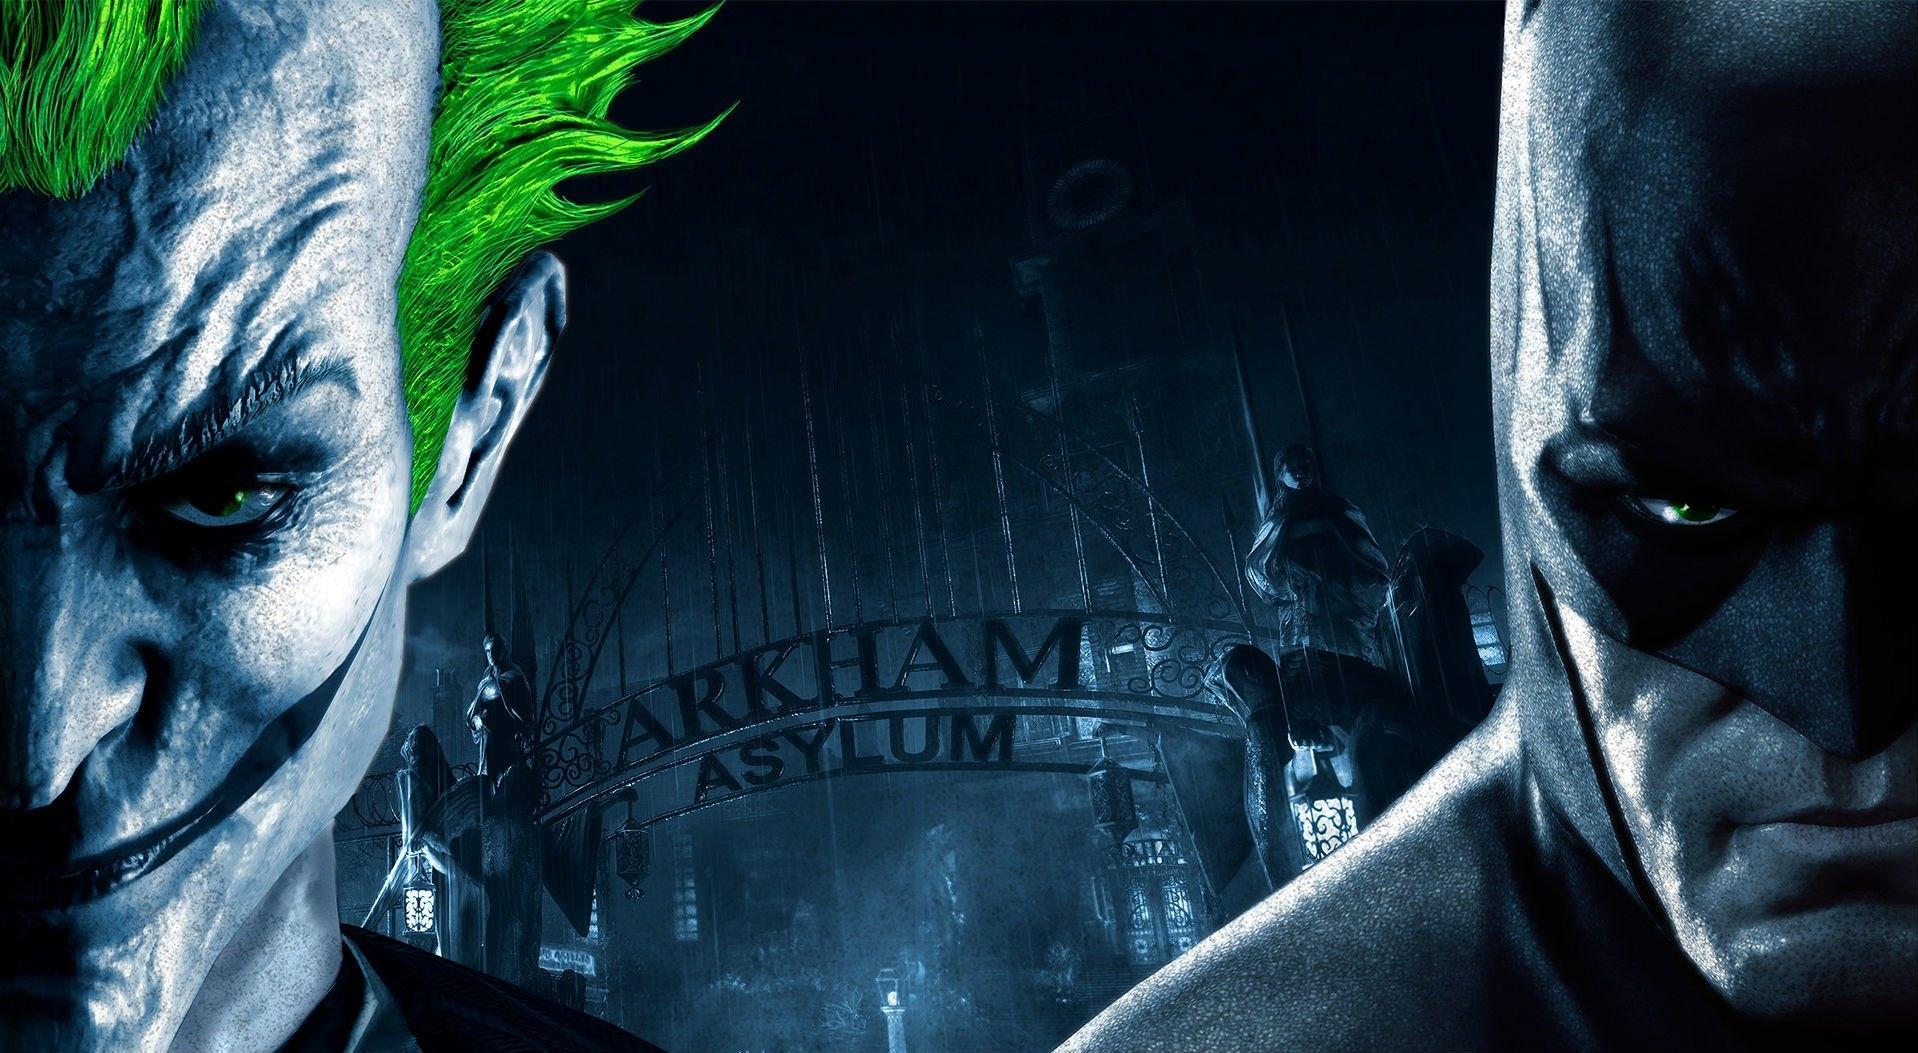 43 batman: arkham asylum hd wallpapers | background images